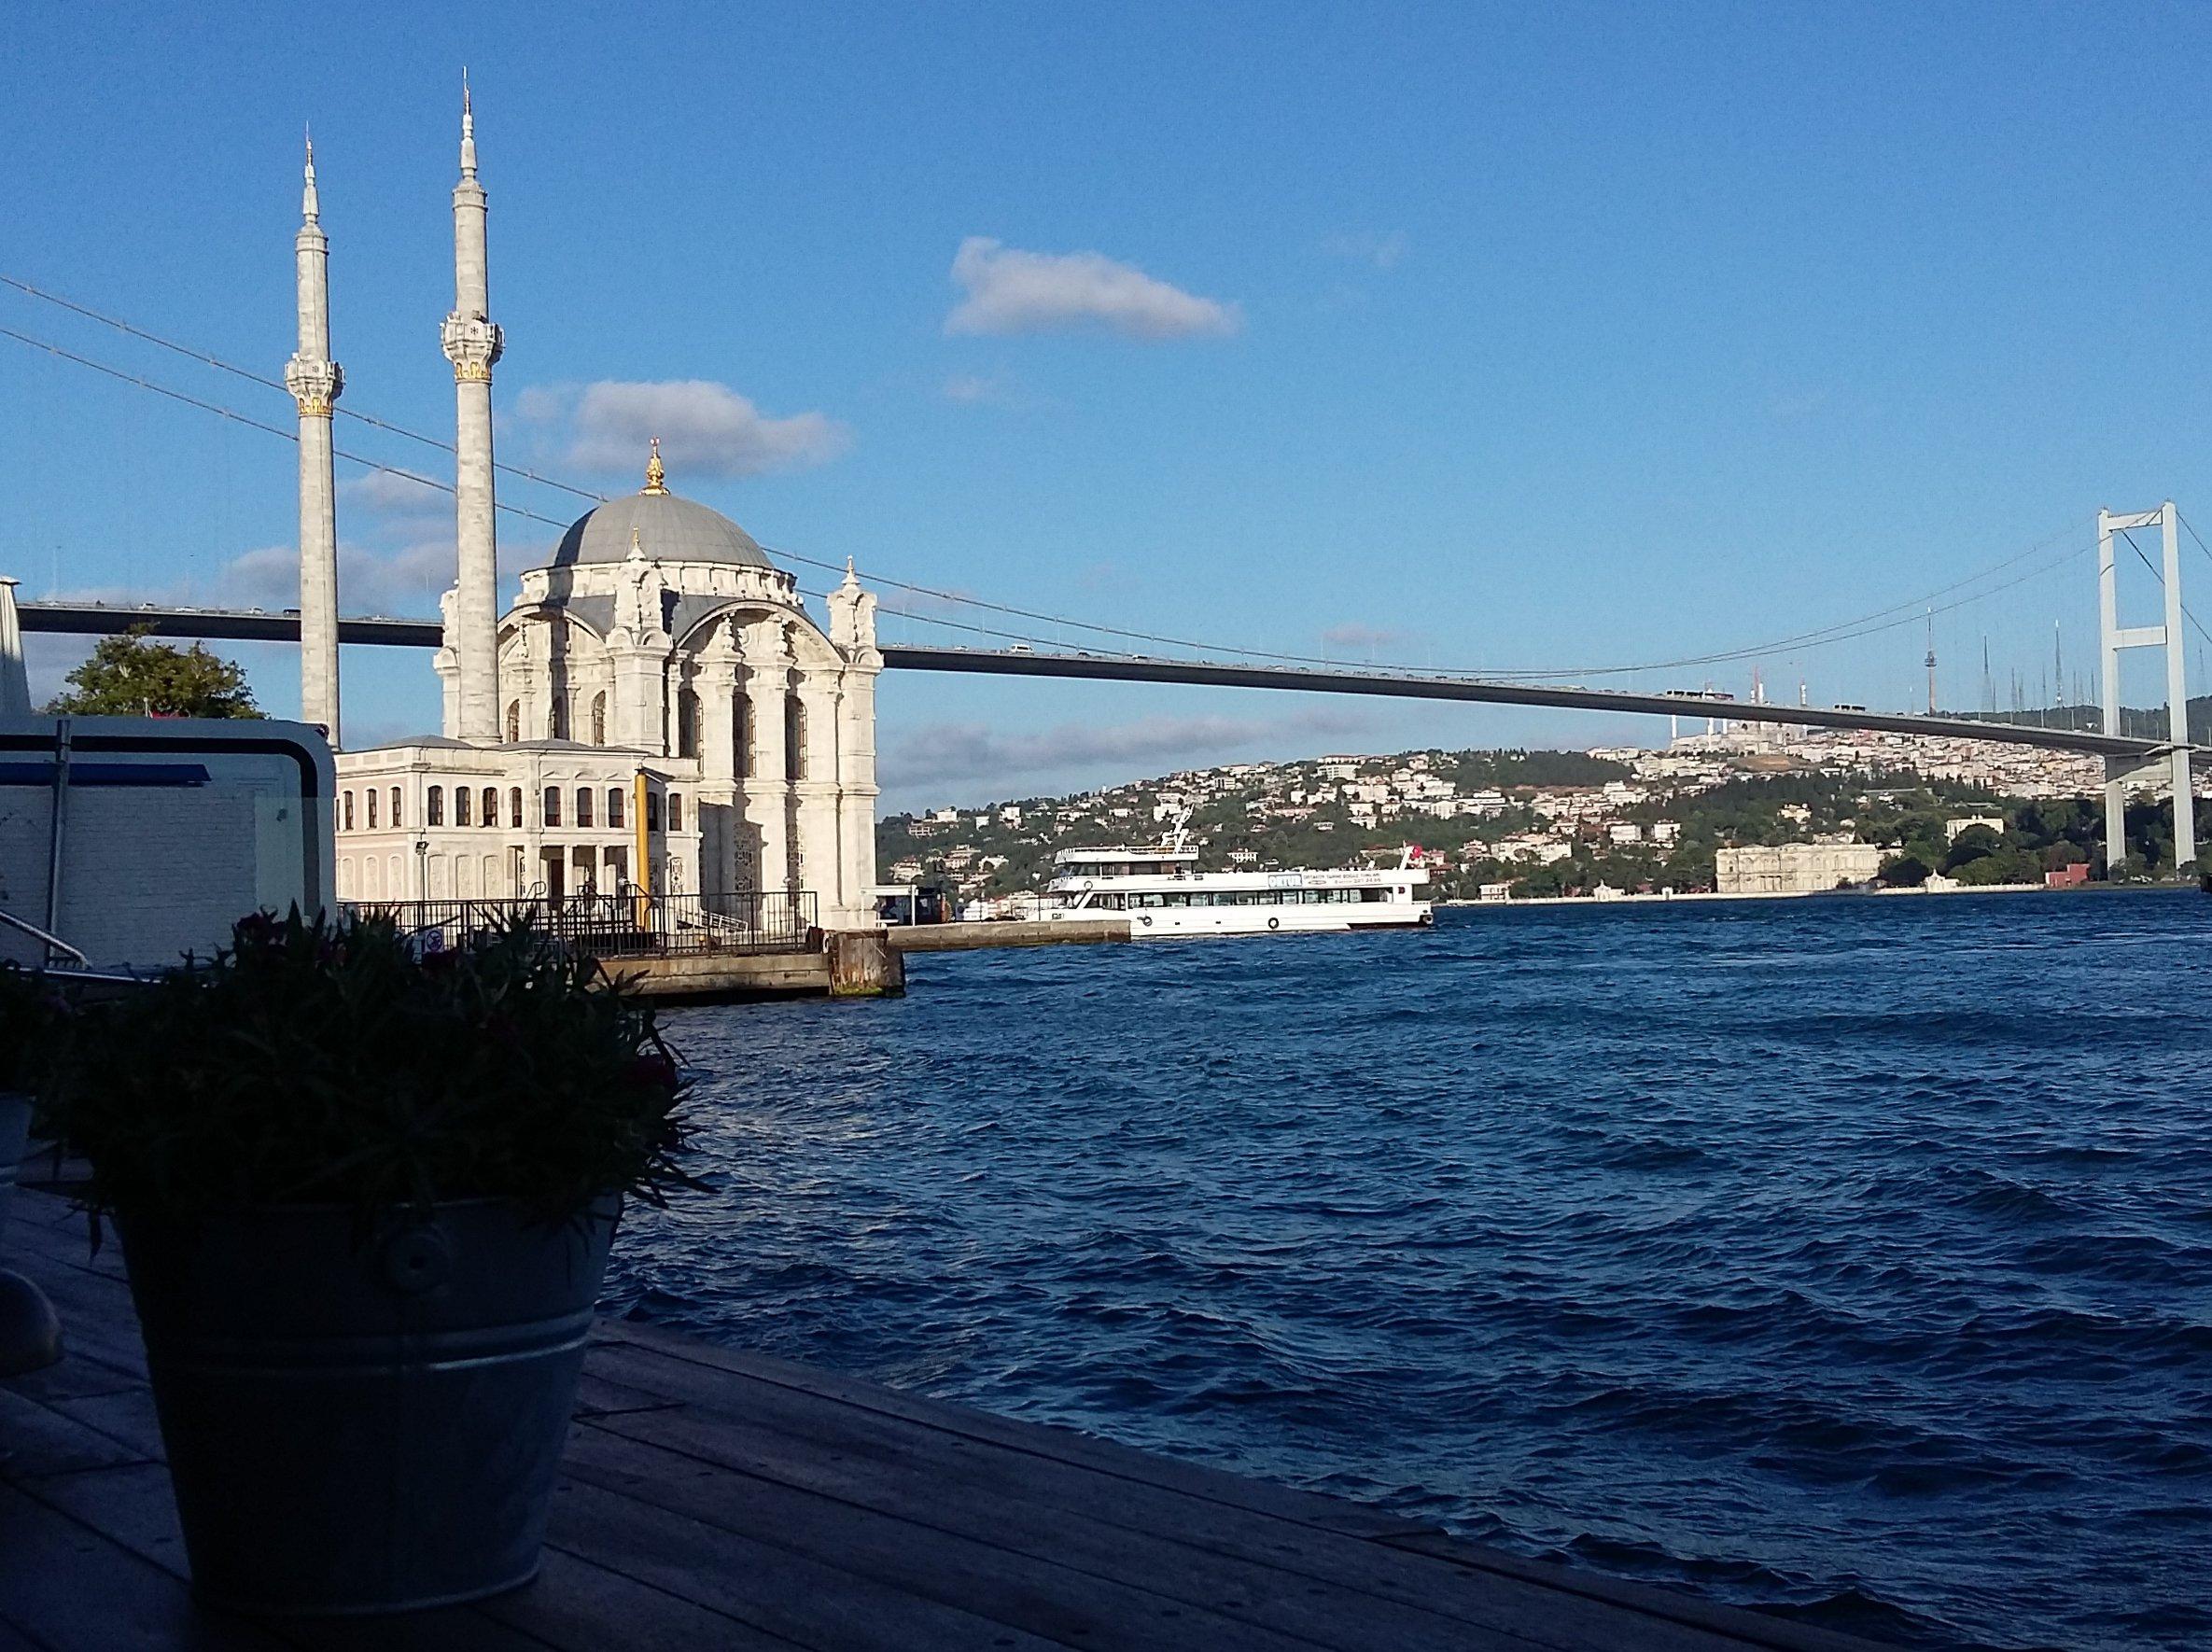 Bosphorus Bridge, Istanbul, Turkey, 2016 Veronique Barbelet/ODI